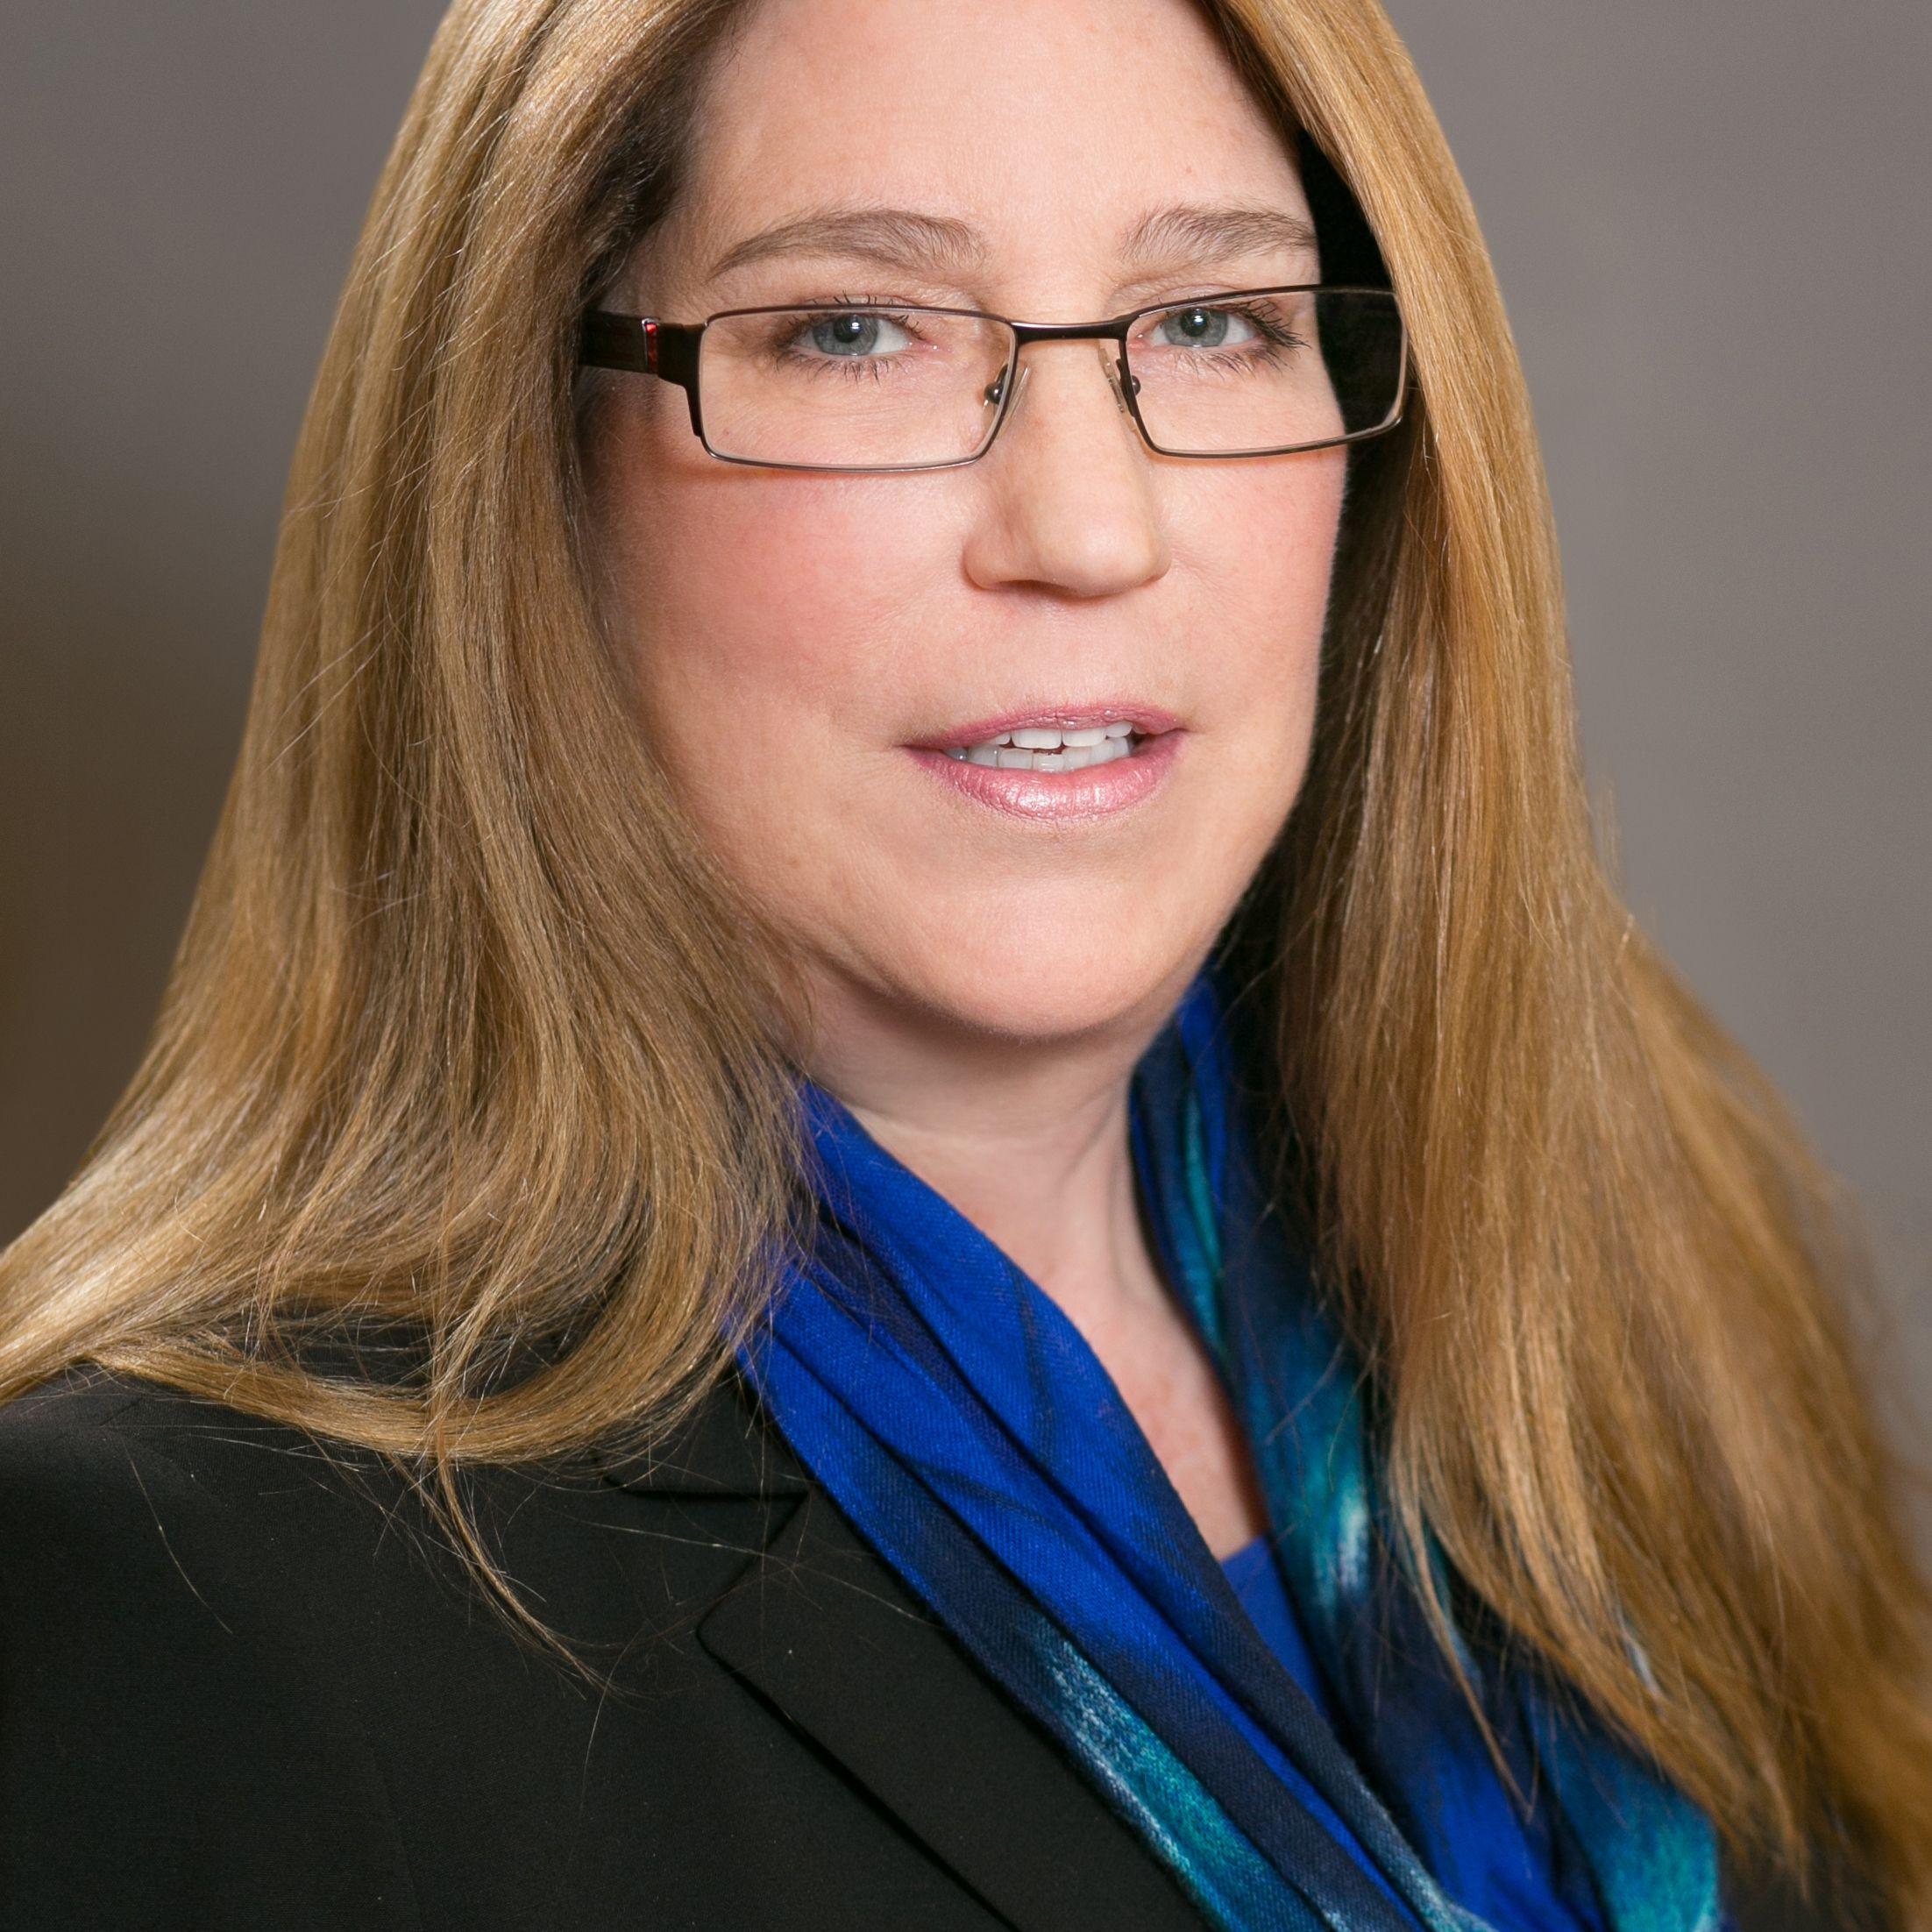 Shellie Ransburg